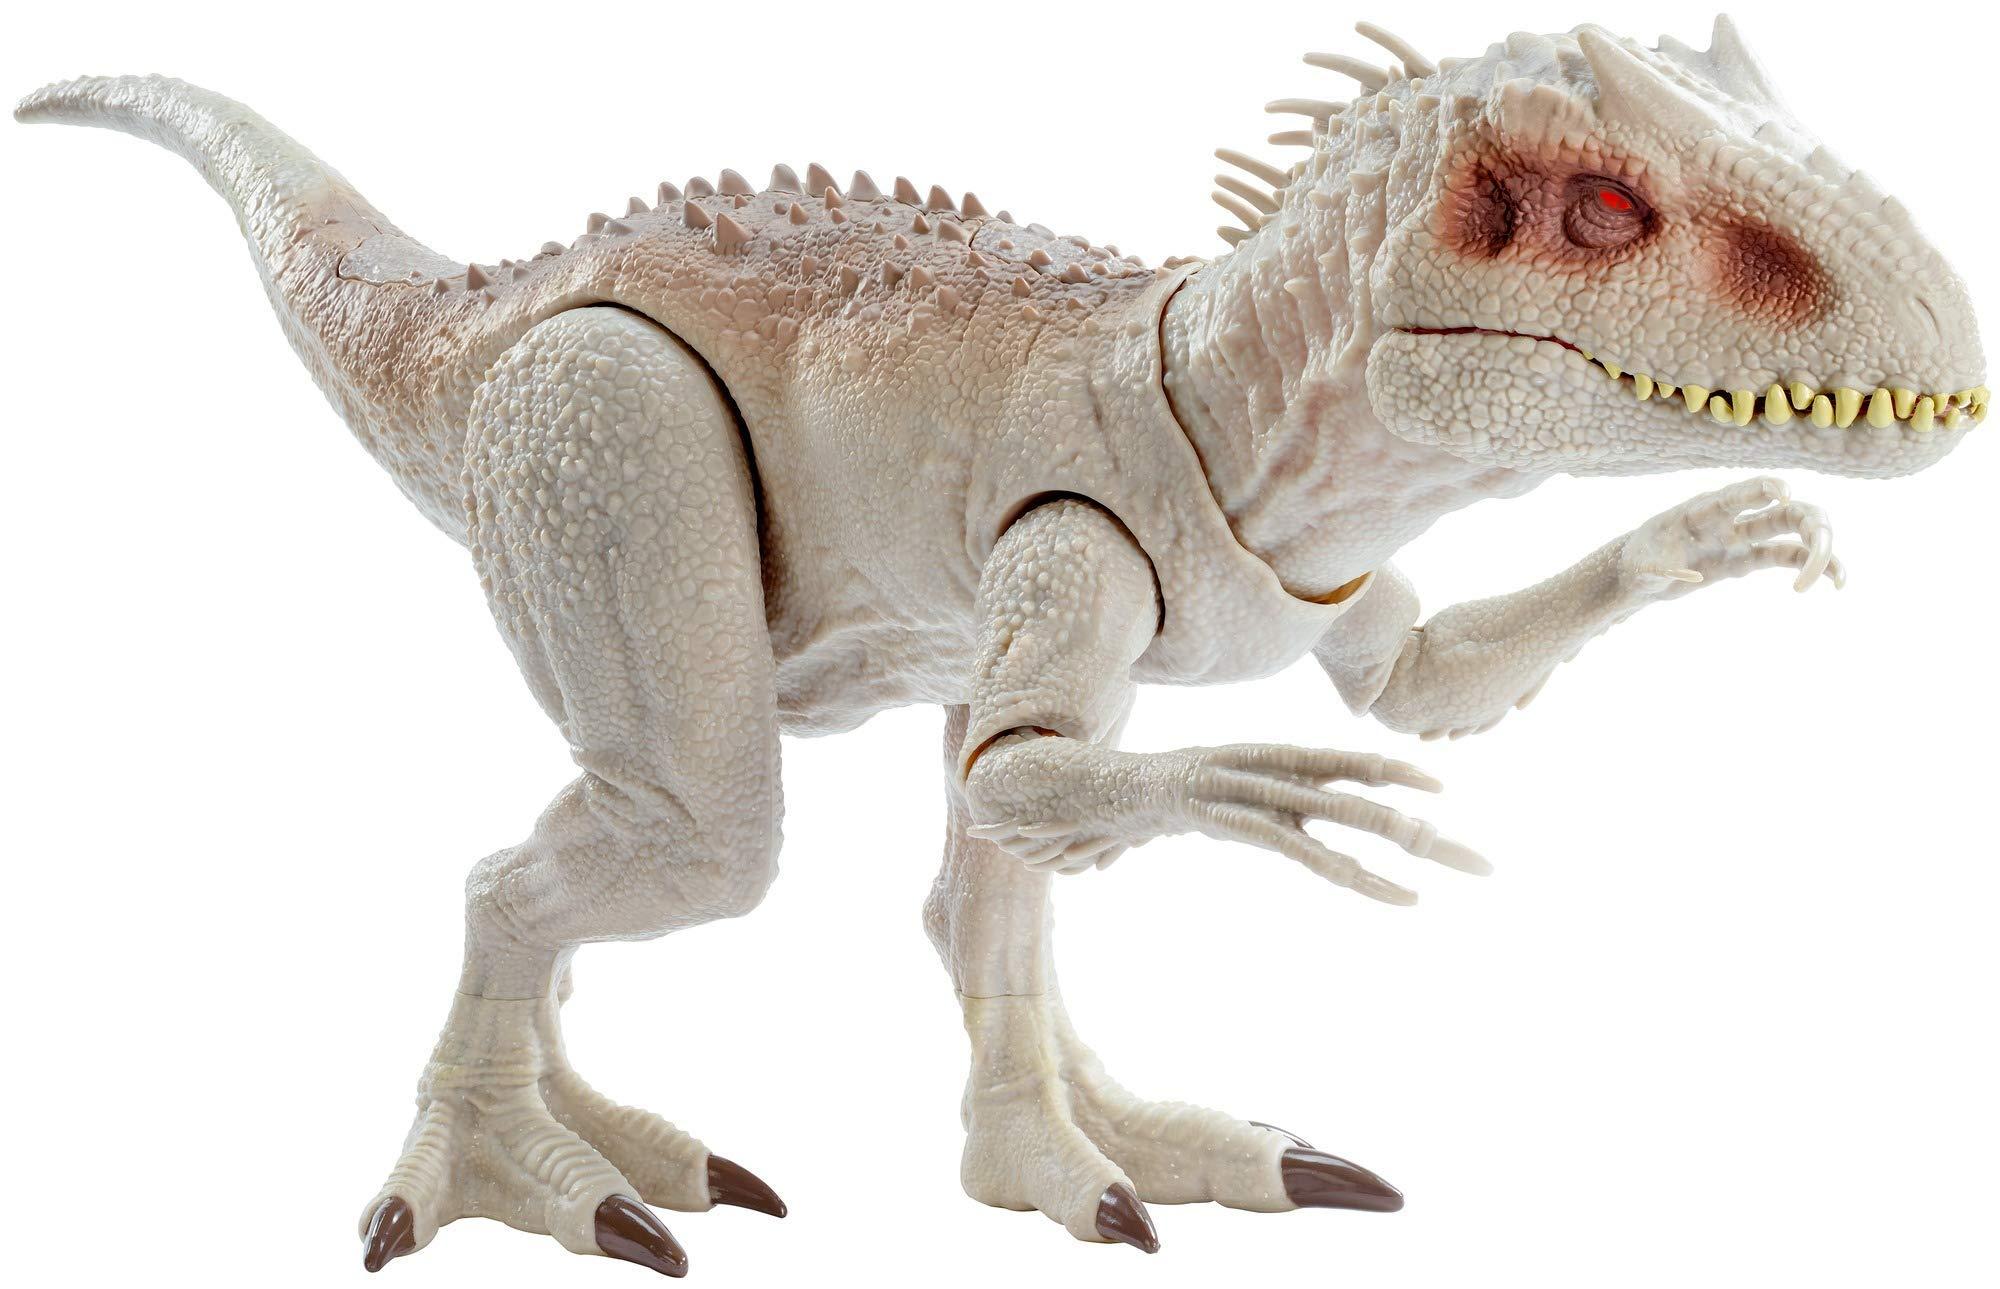 Jurassic-World-Dino-Rivals-Indominus-Rex-dinosaurio-de-juguete-para-nios-4-aos-Mattel-GCT95